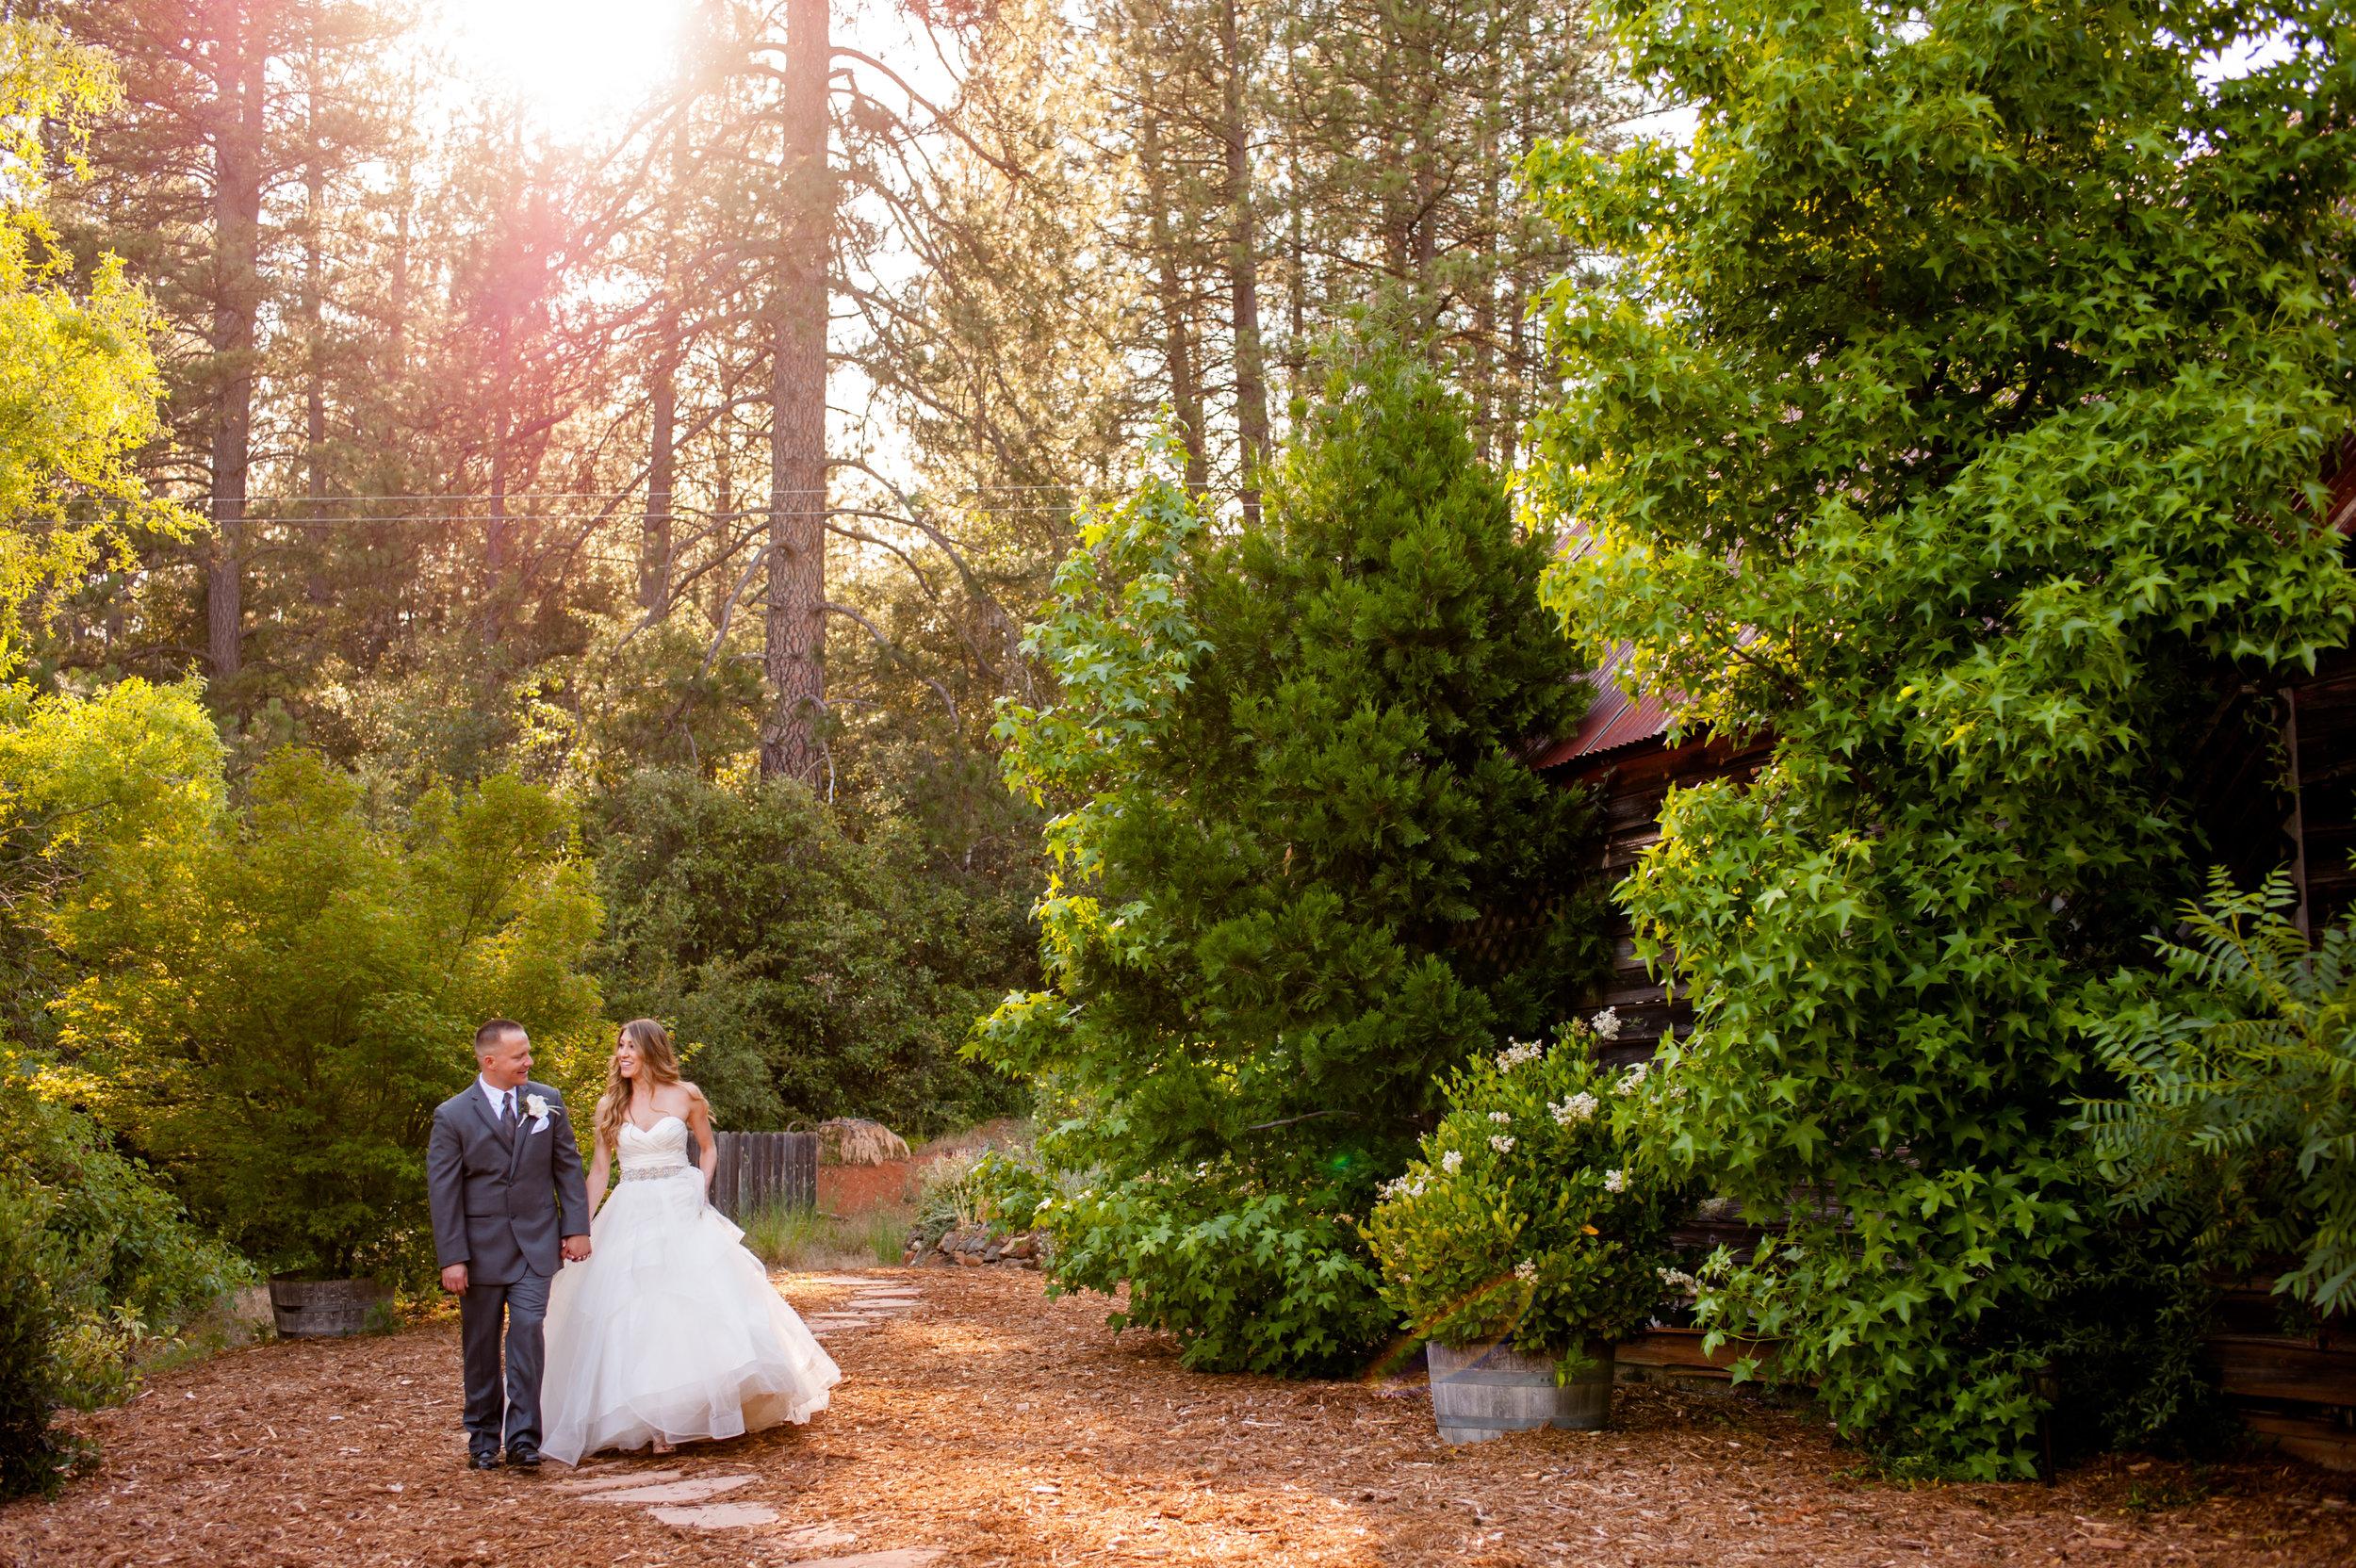 nicole-luke-027-onte-verde-inn-foresthill-wedding-photographer-katherine-nicole-photography.JPG